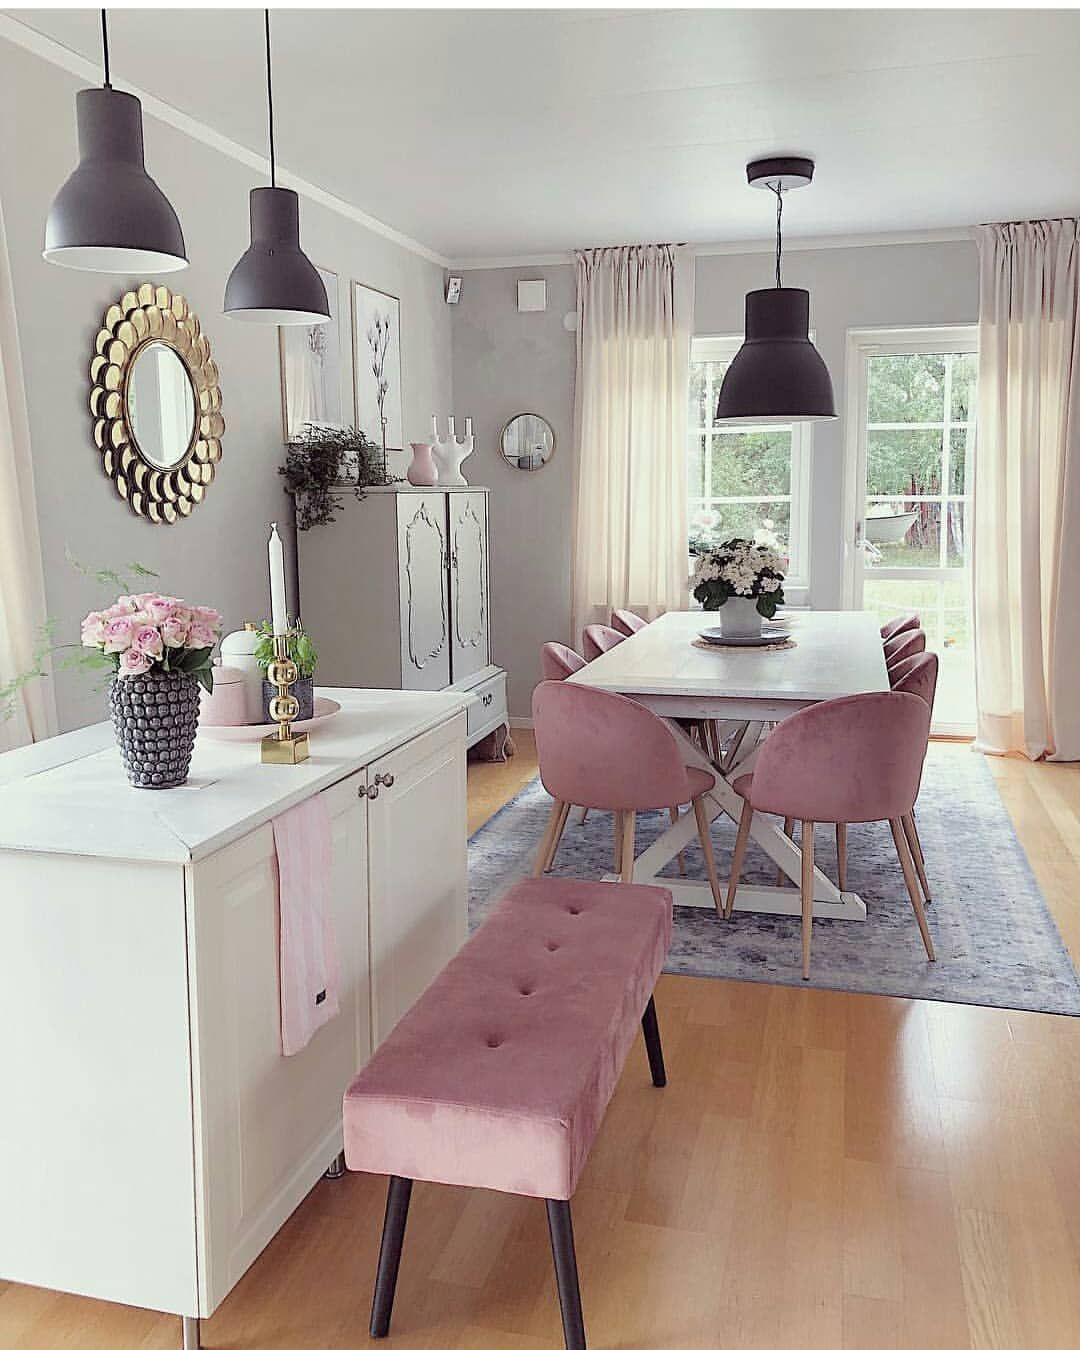 Home Design Home Design68 Instagram Posts Videos Stories On